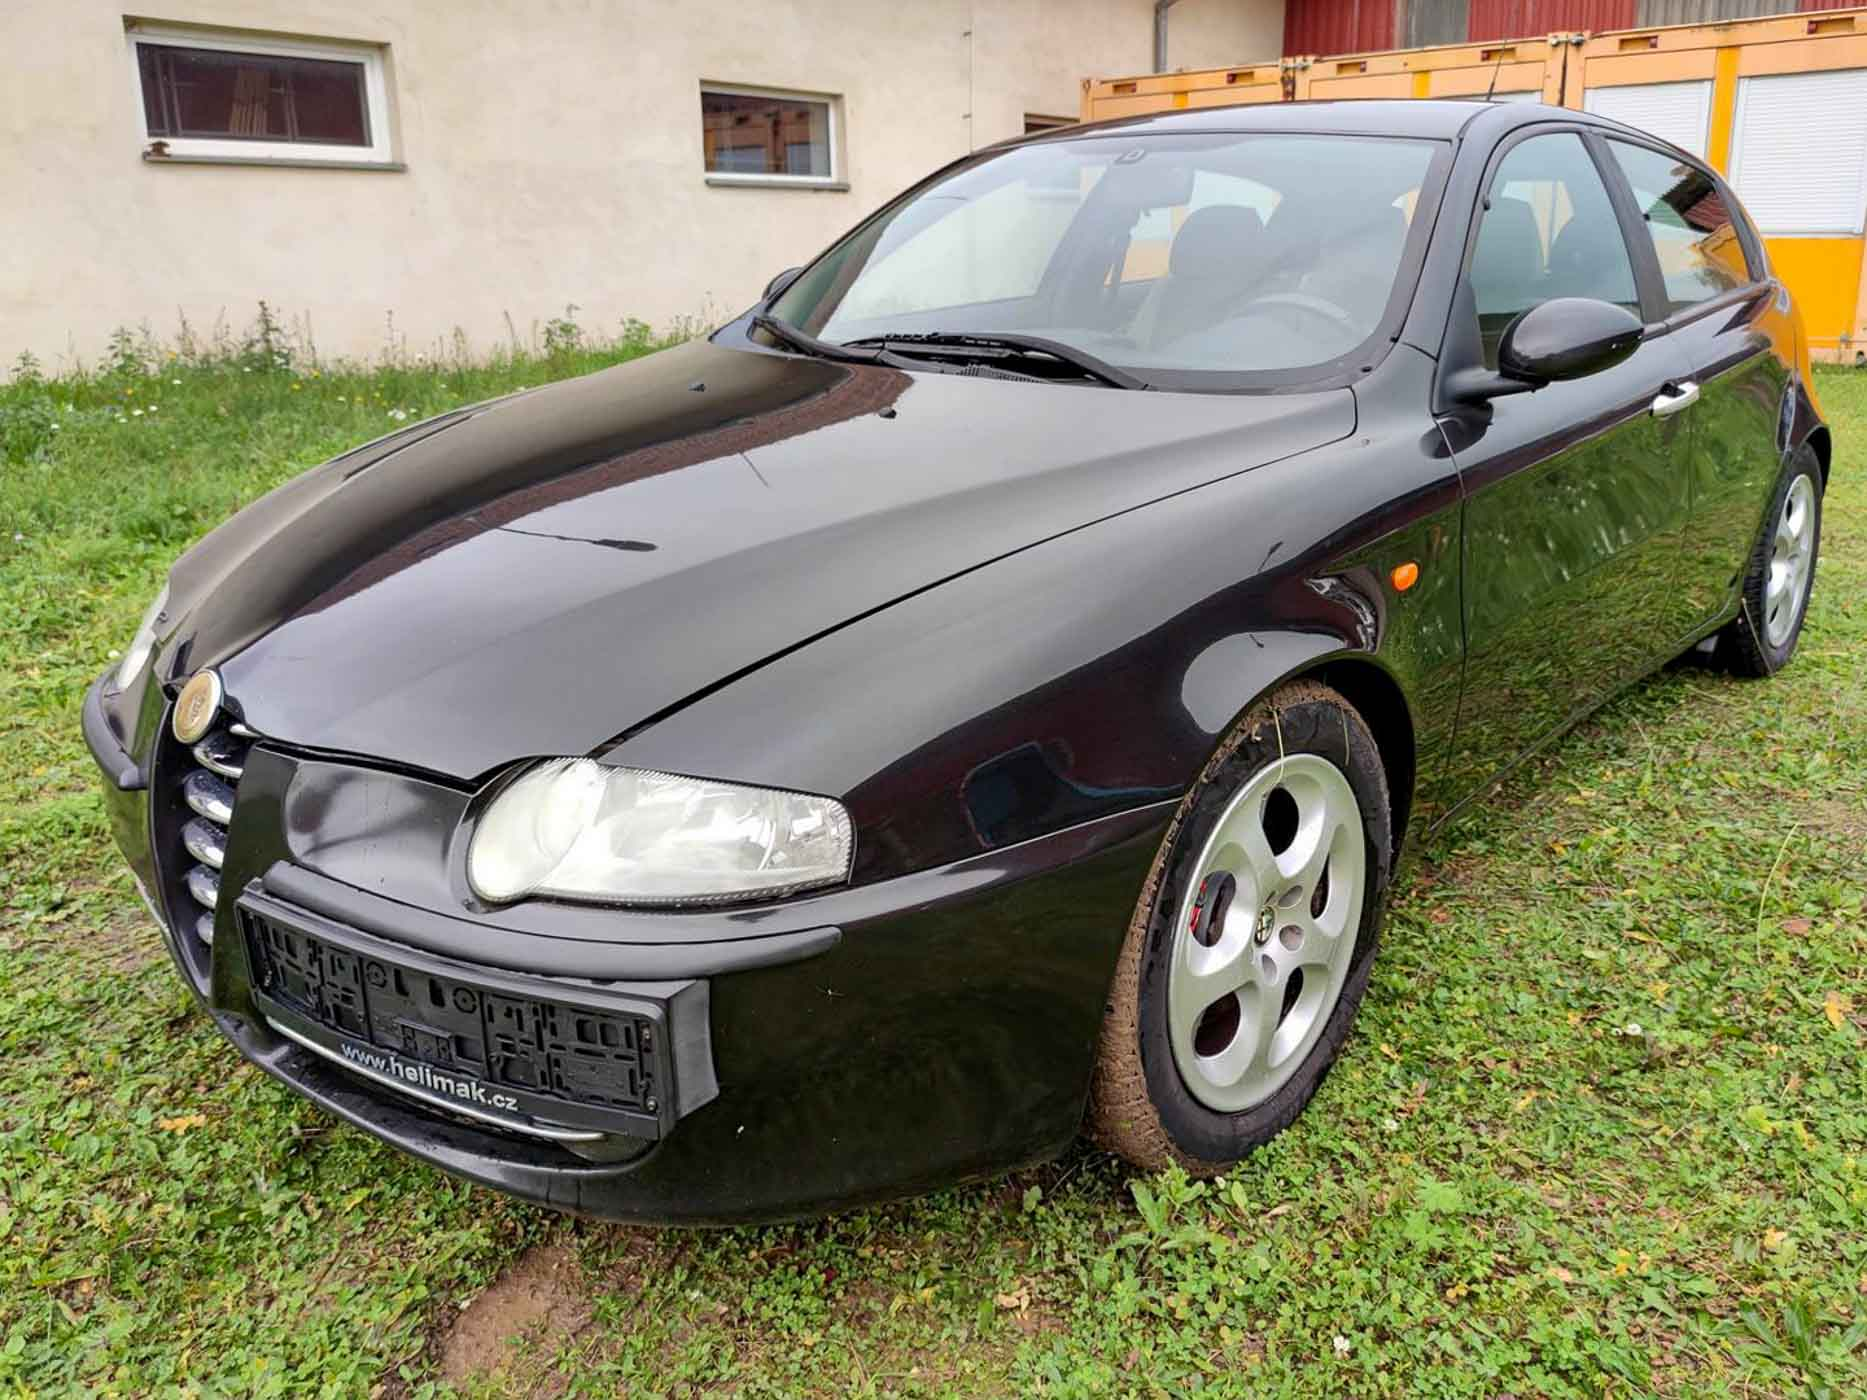 Alfa Romeo 147, www.swisscars.cz